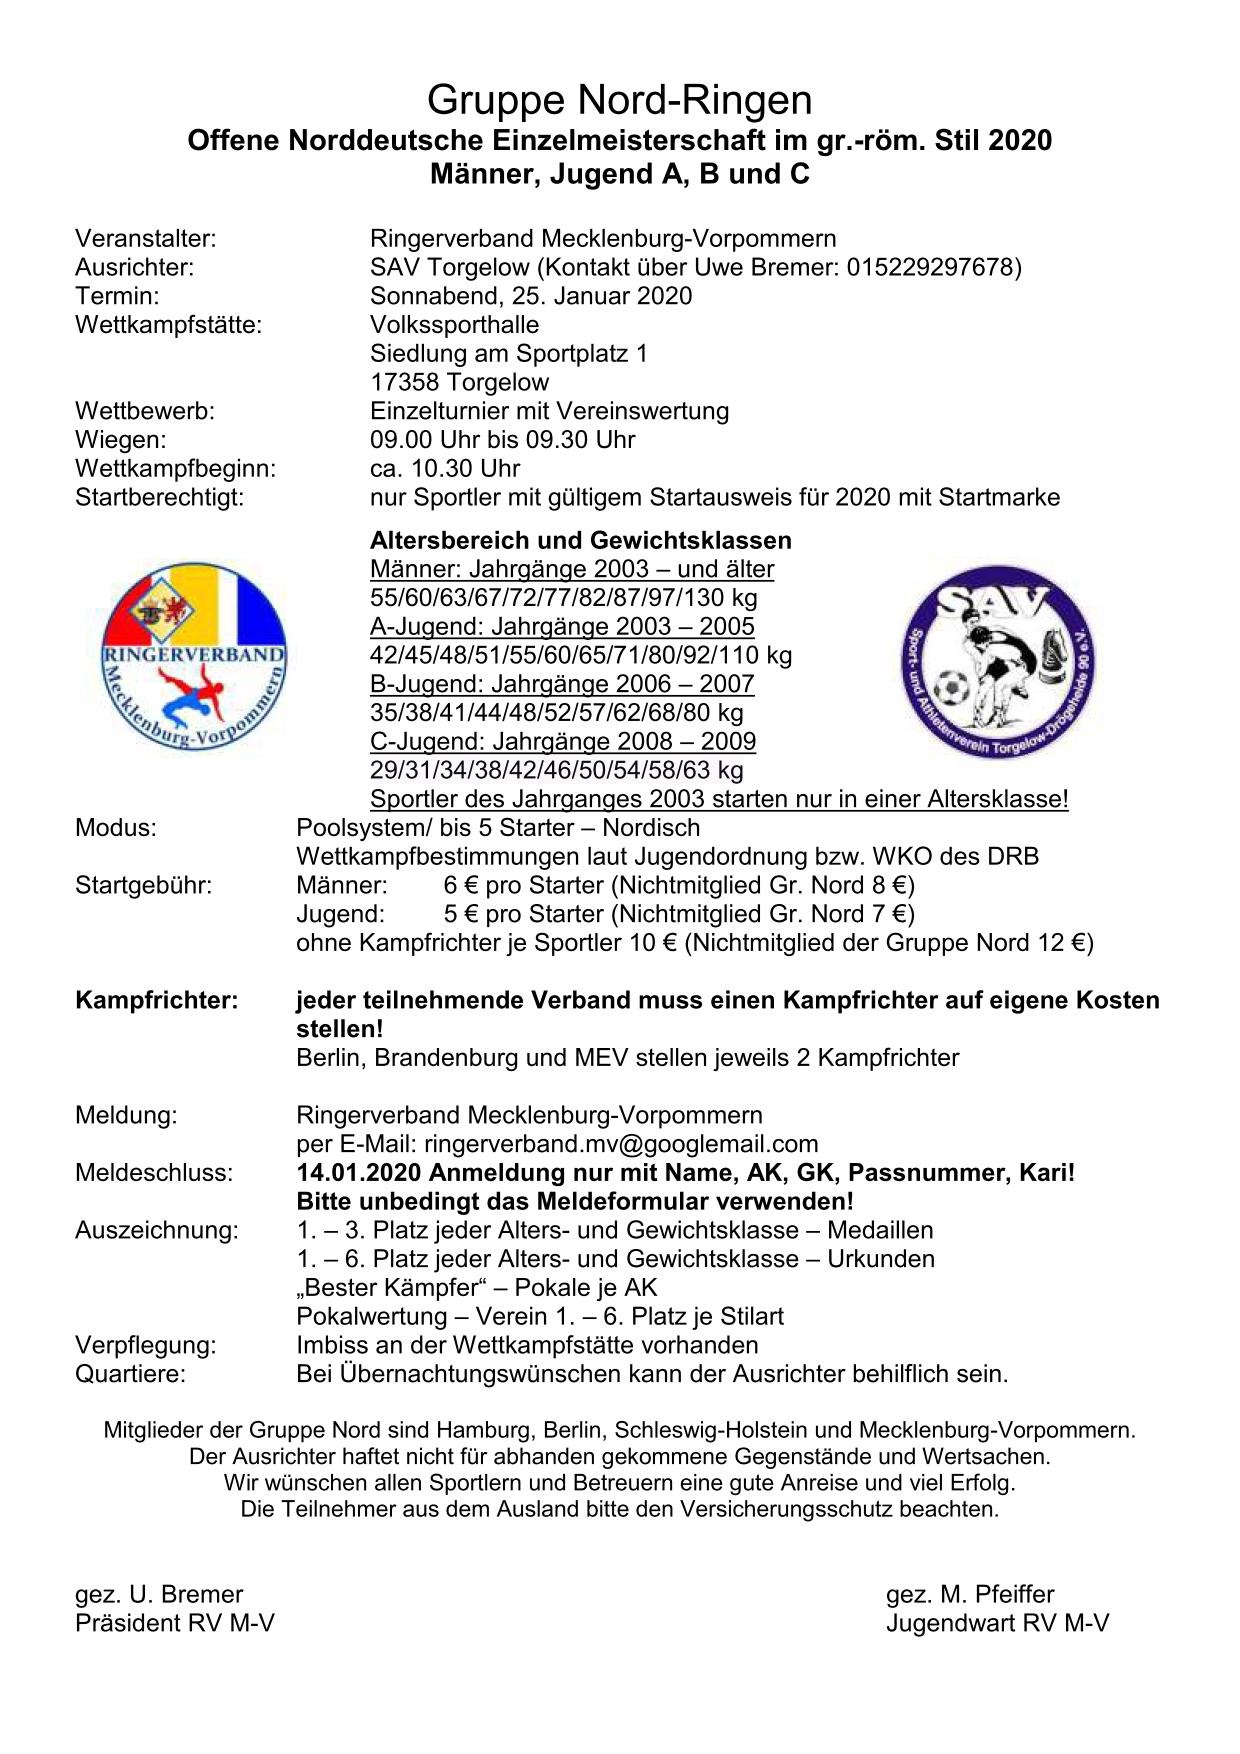 Offene Norddeutsche Meisterschaft 2020 Männer, Jugend A, B und C GR